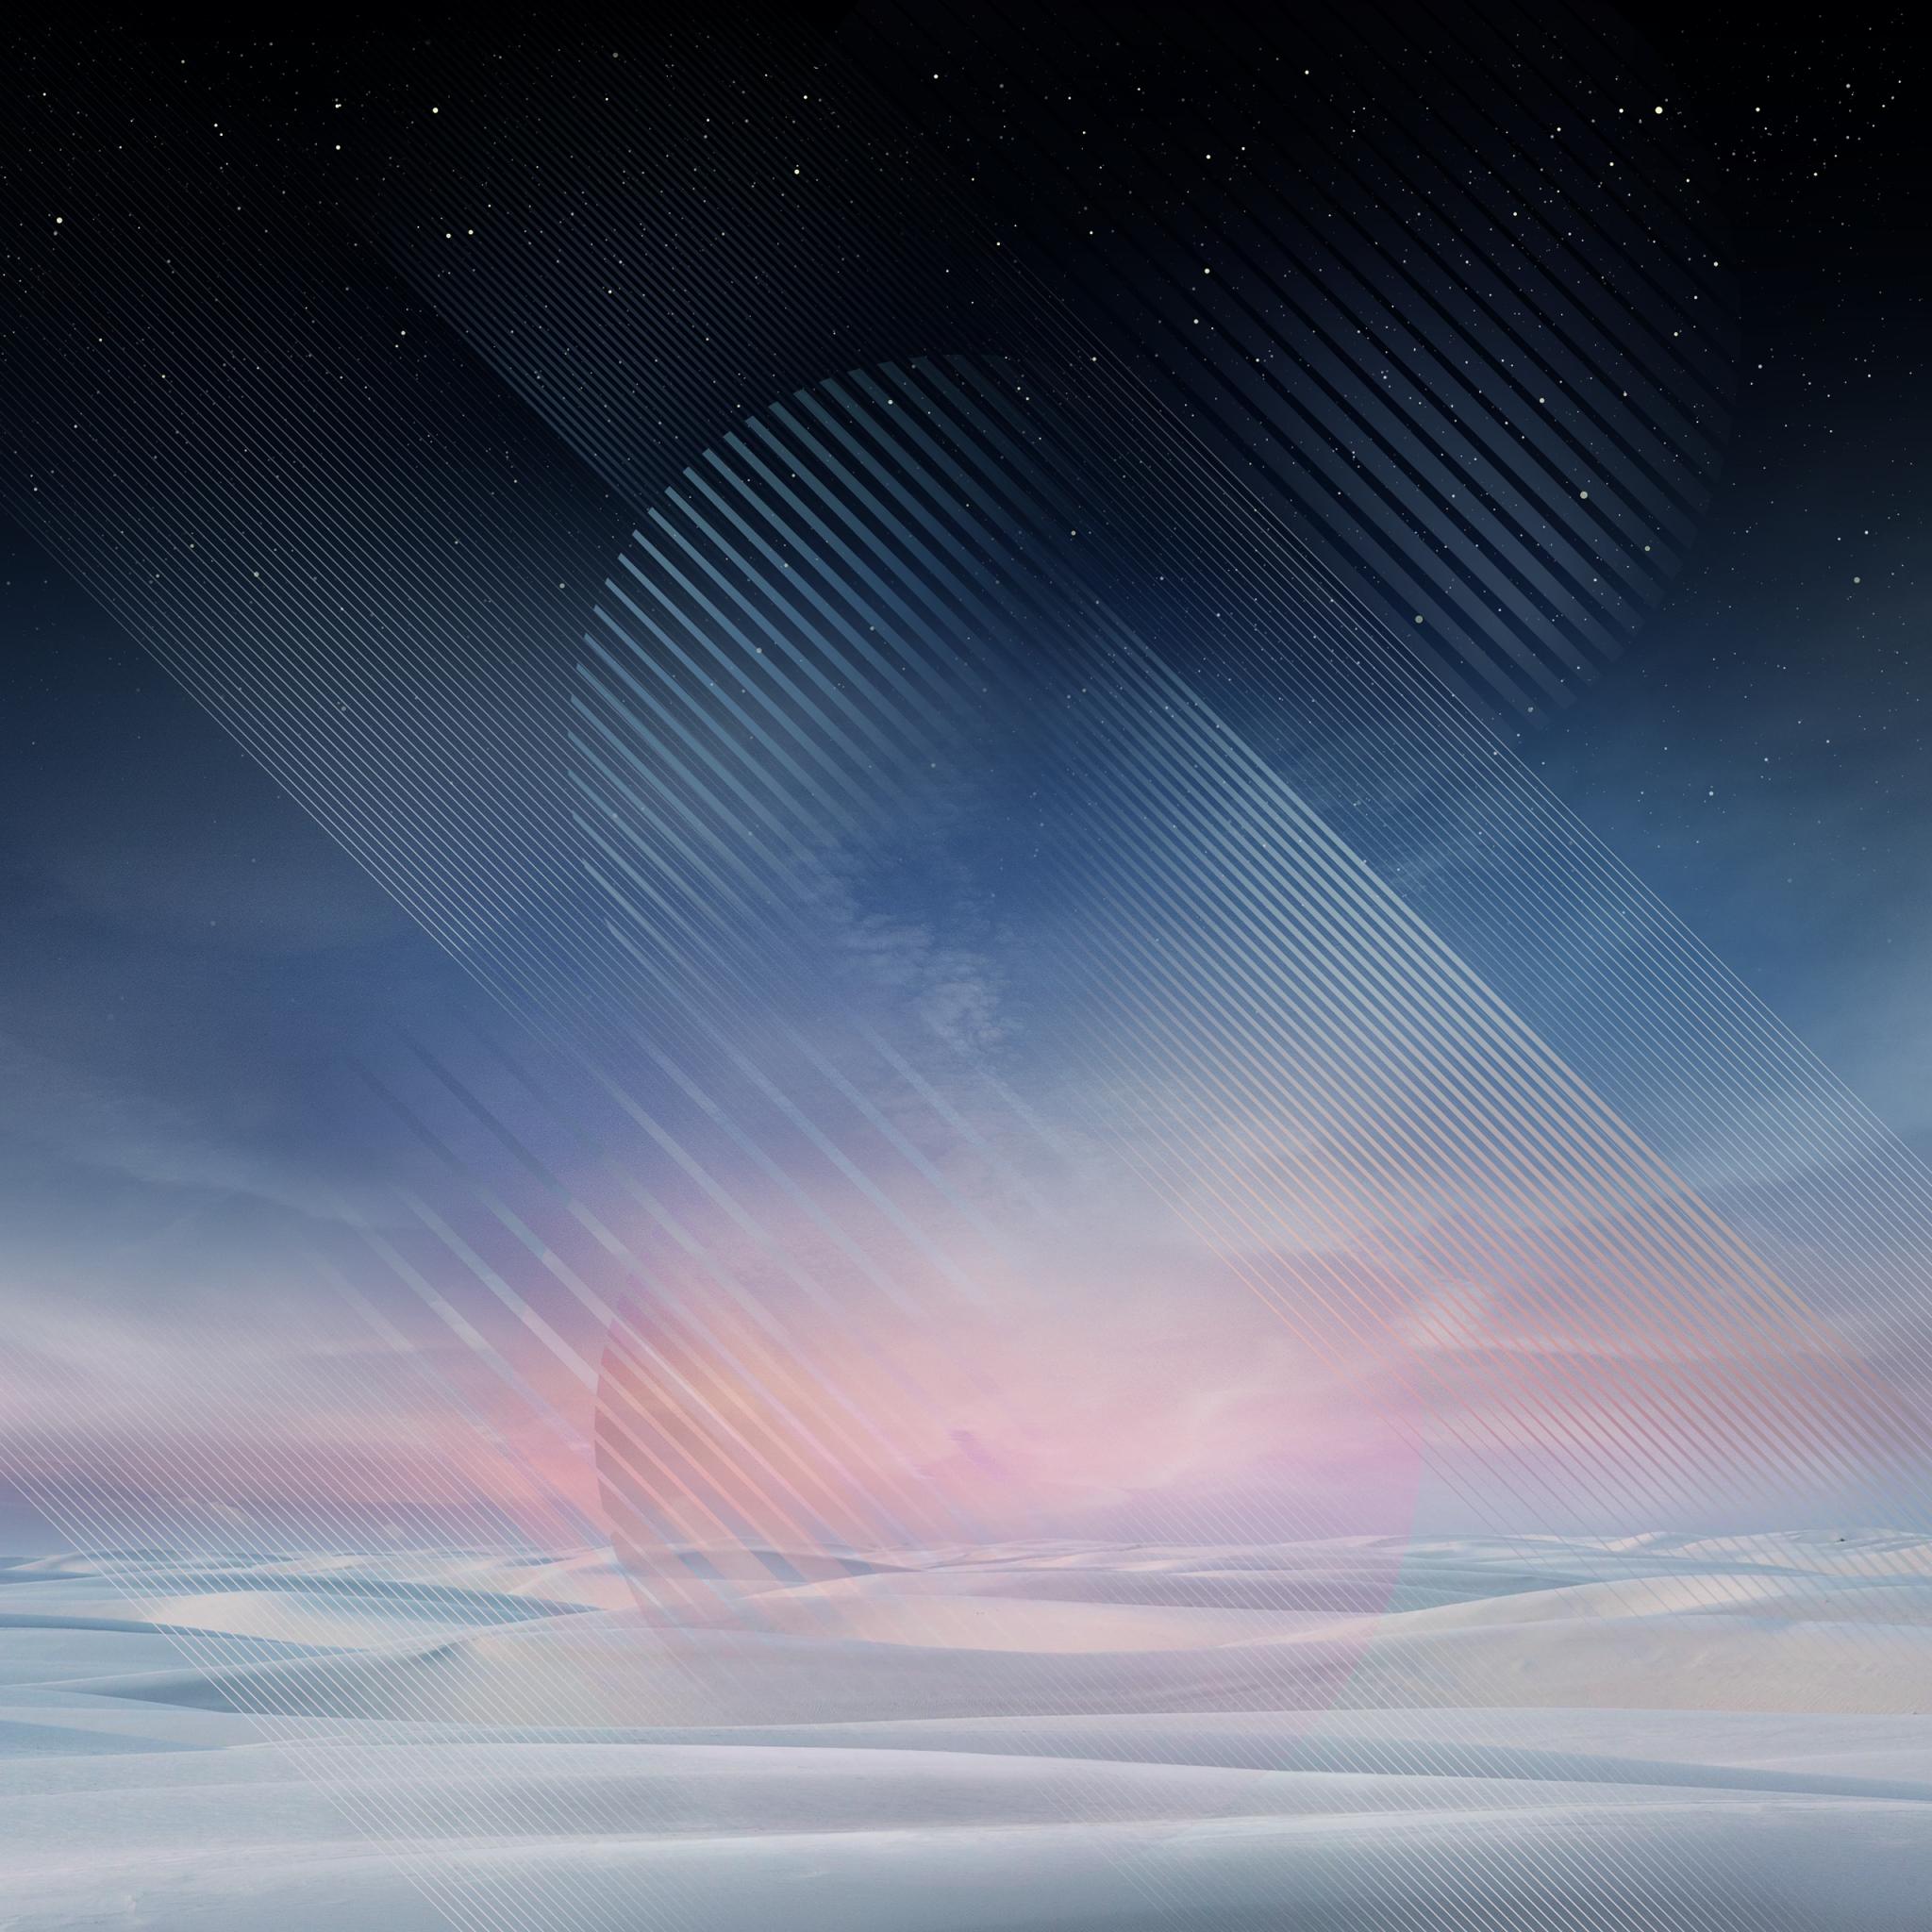 galaxy_note8-wallpapers_techfoogle.com_13